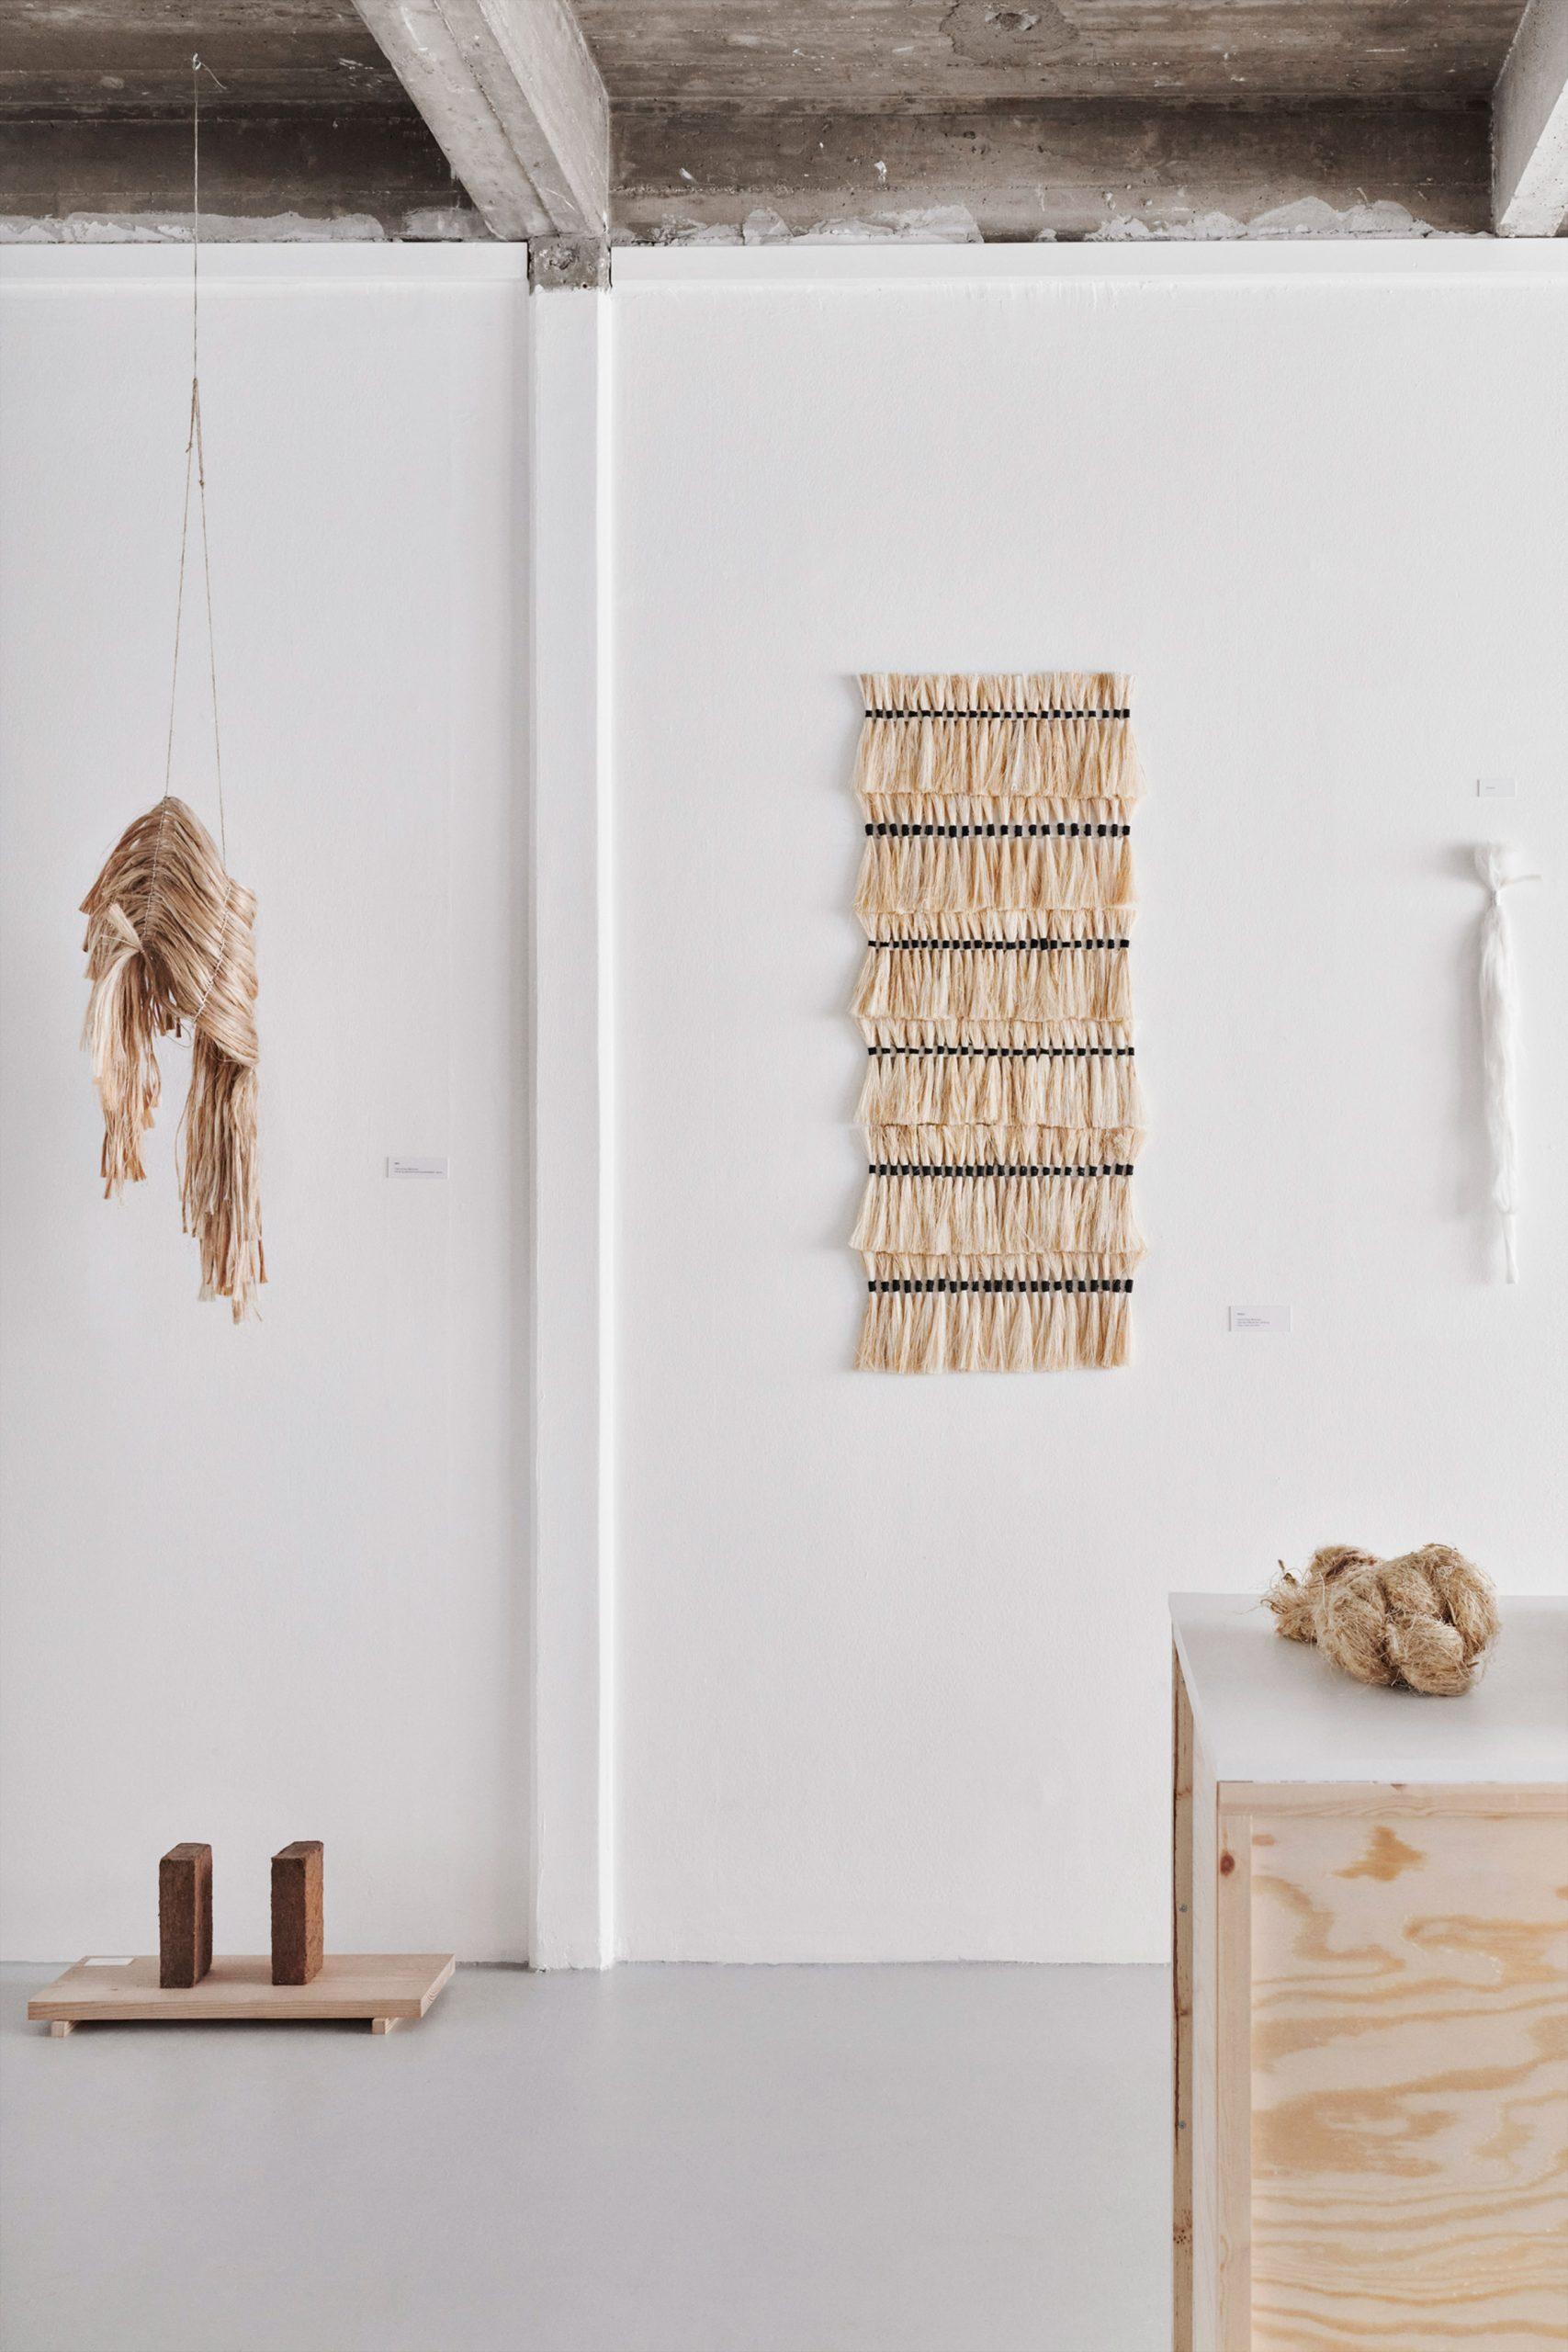 Coconut bricks at Phytophilia by Sara Martinsen